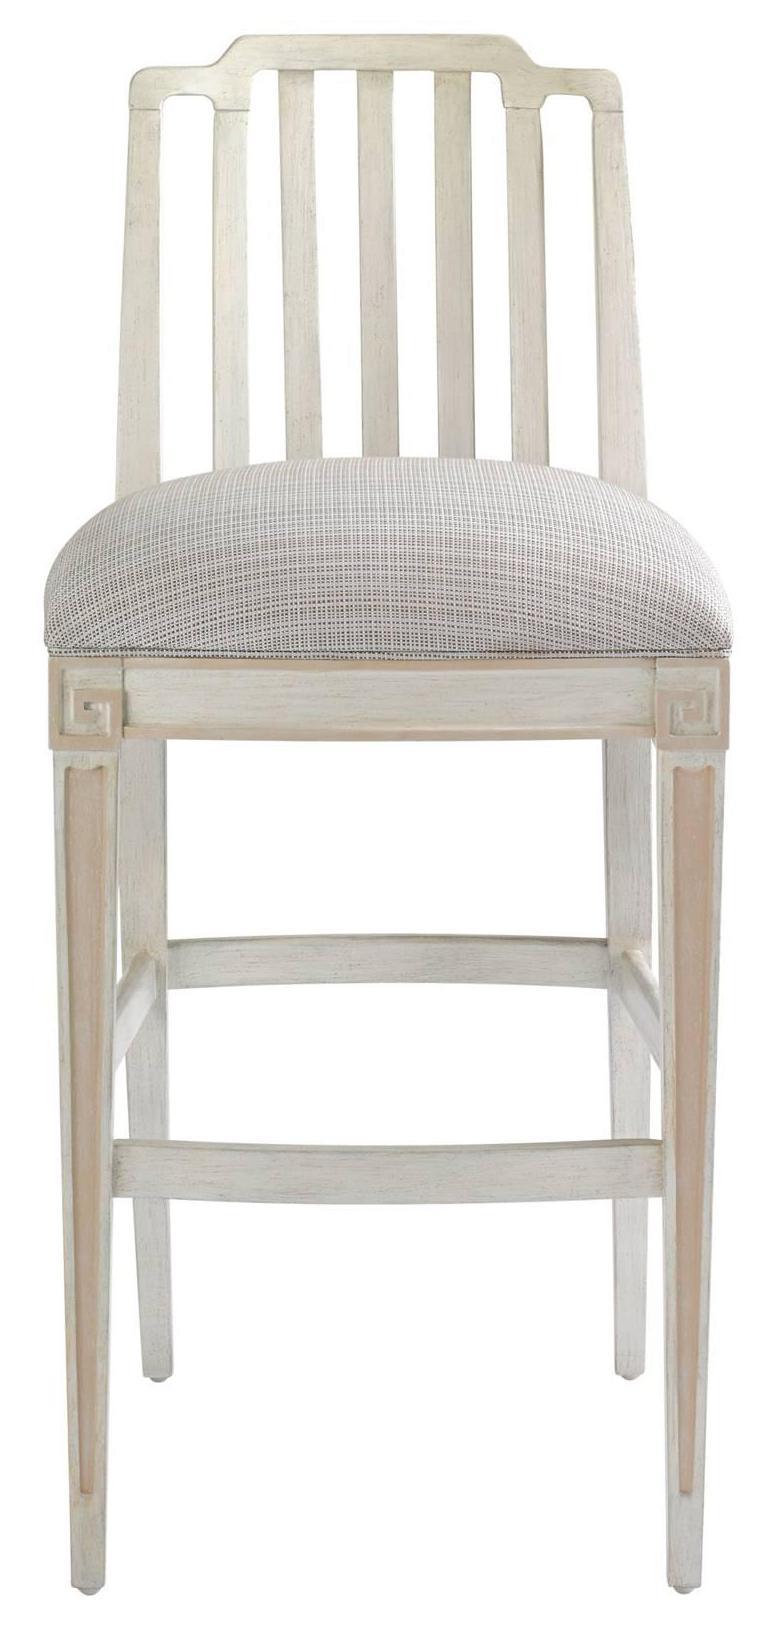 Stanley Furniture Preserve Marshall Bar Stool - Item Number: 340-21-73